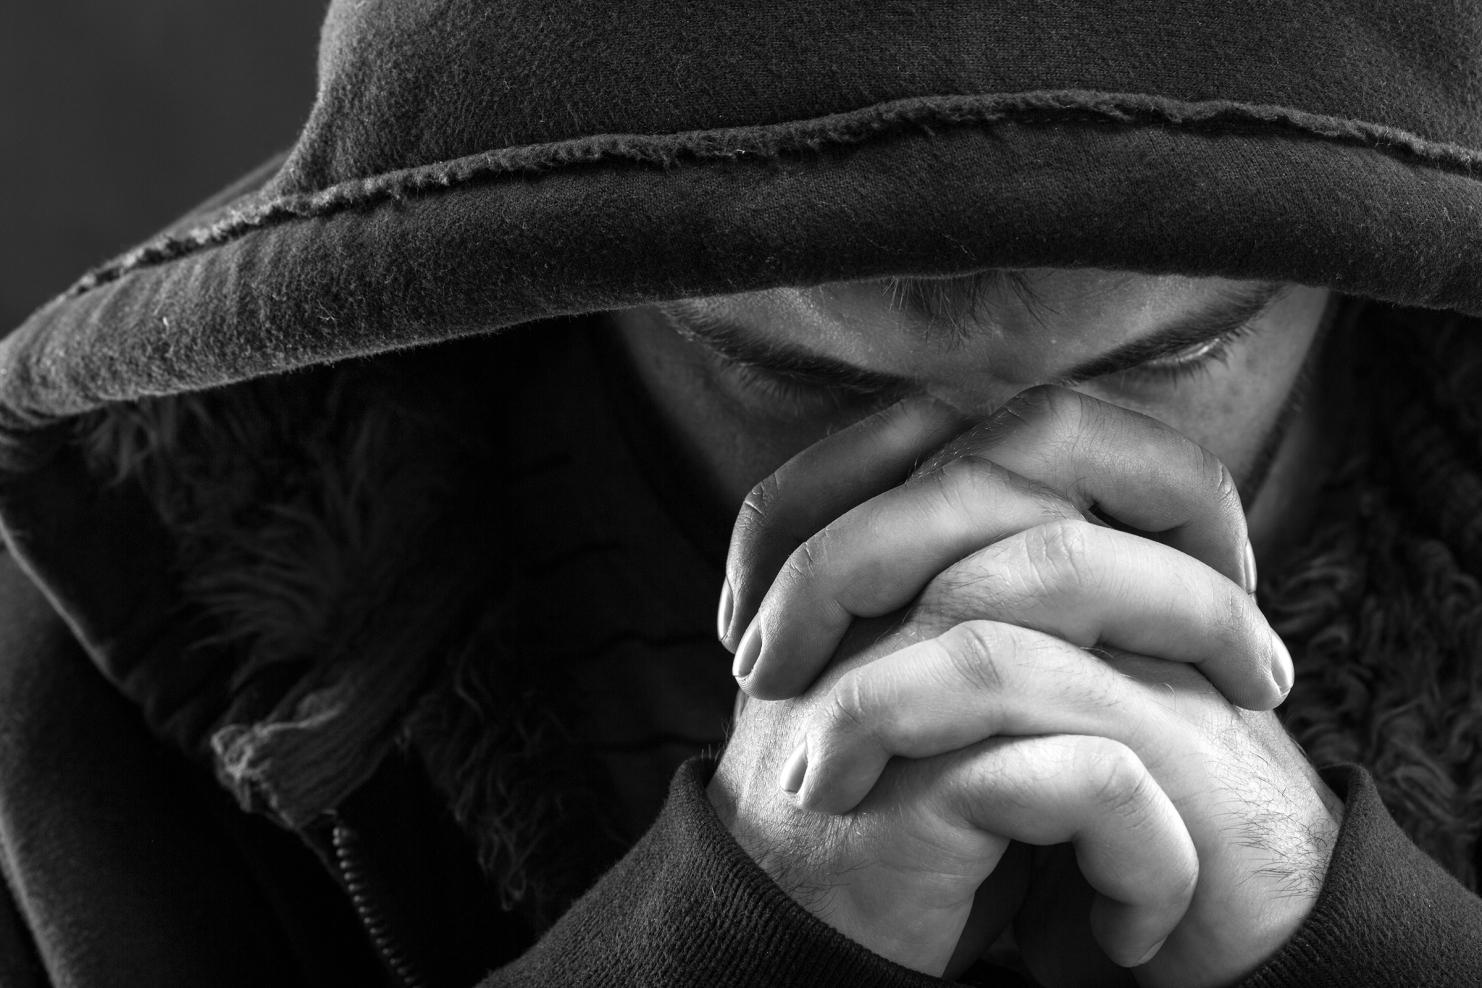 web-bandit-prayer-forgiveness-nomad-soul-shutterstock_132573299